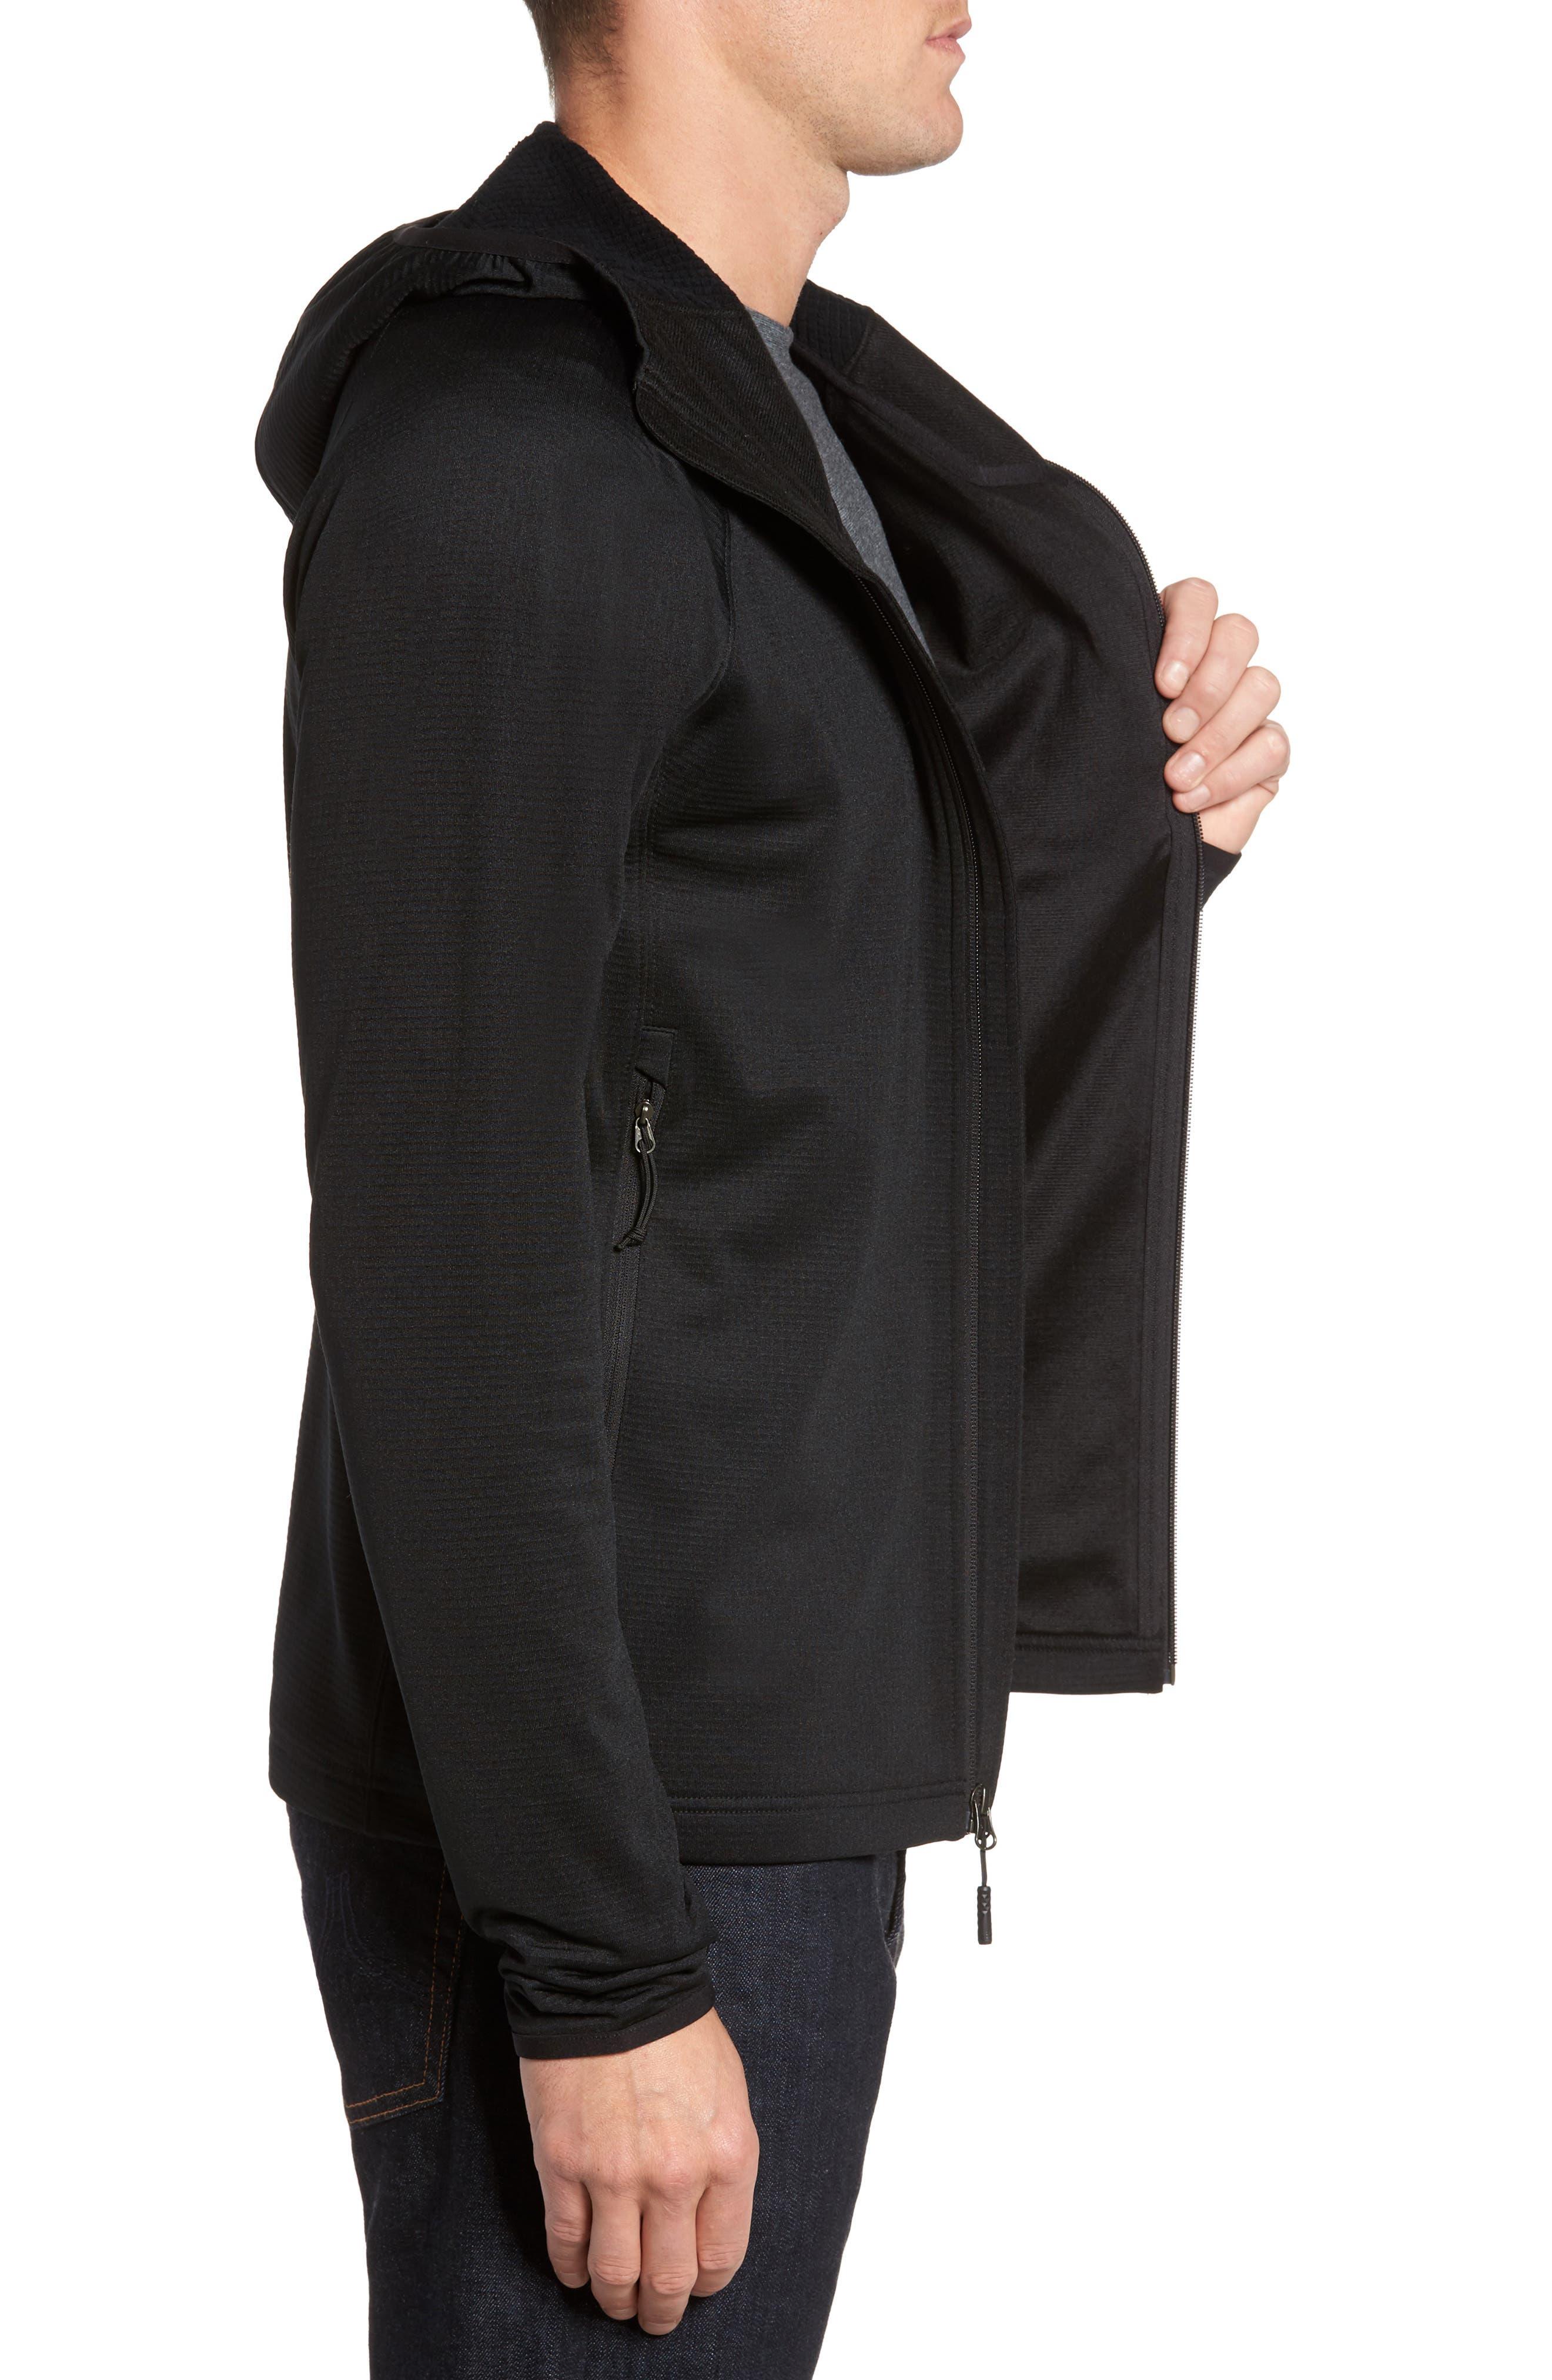 Borod Zip Fleece Jacket,                             Alternate thumbnail 3, color,                             BLACK/ BLACK